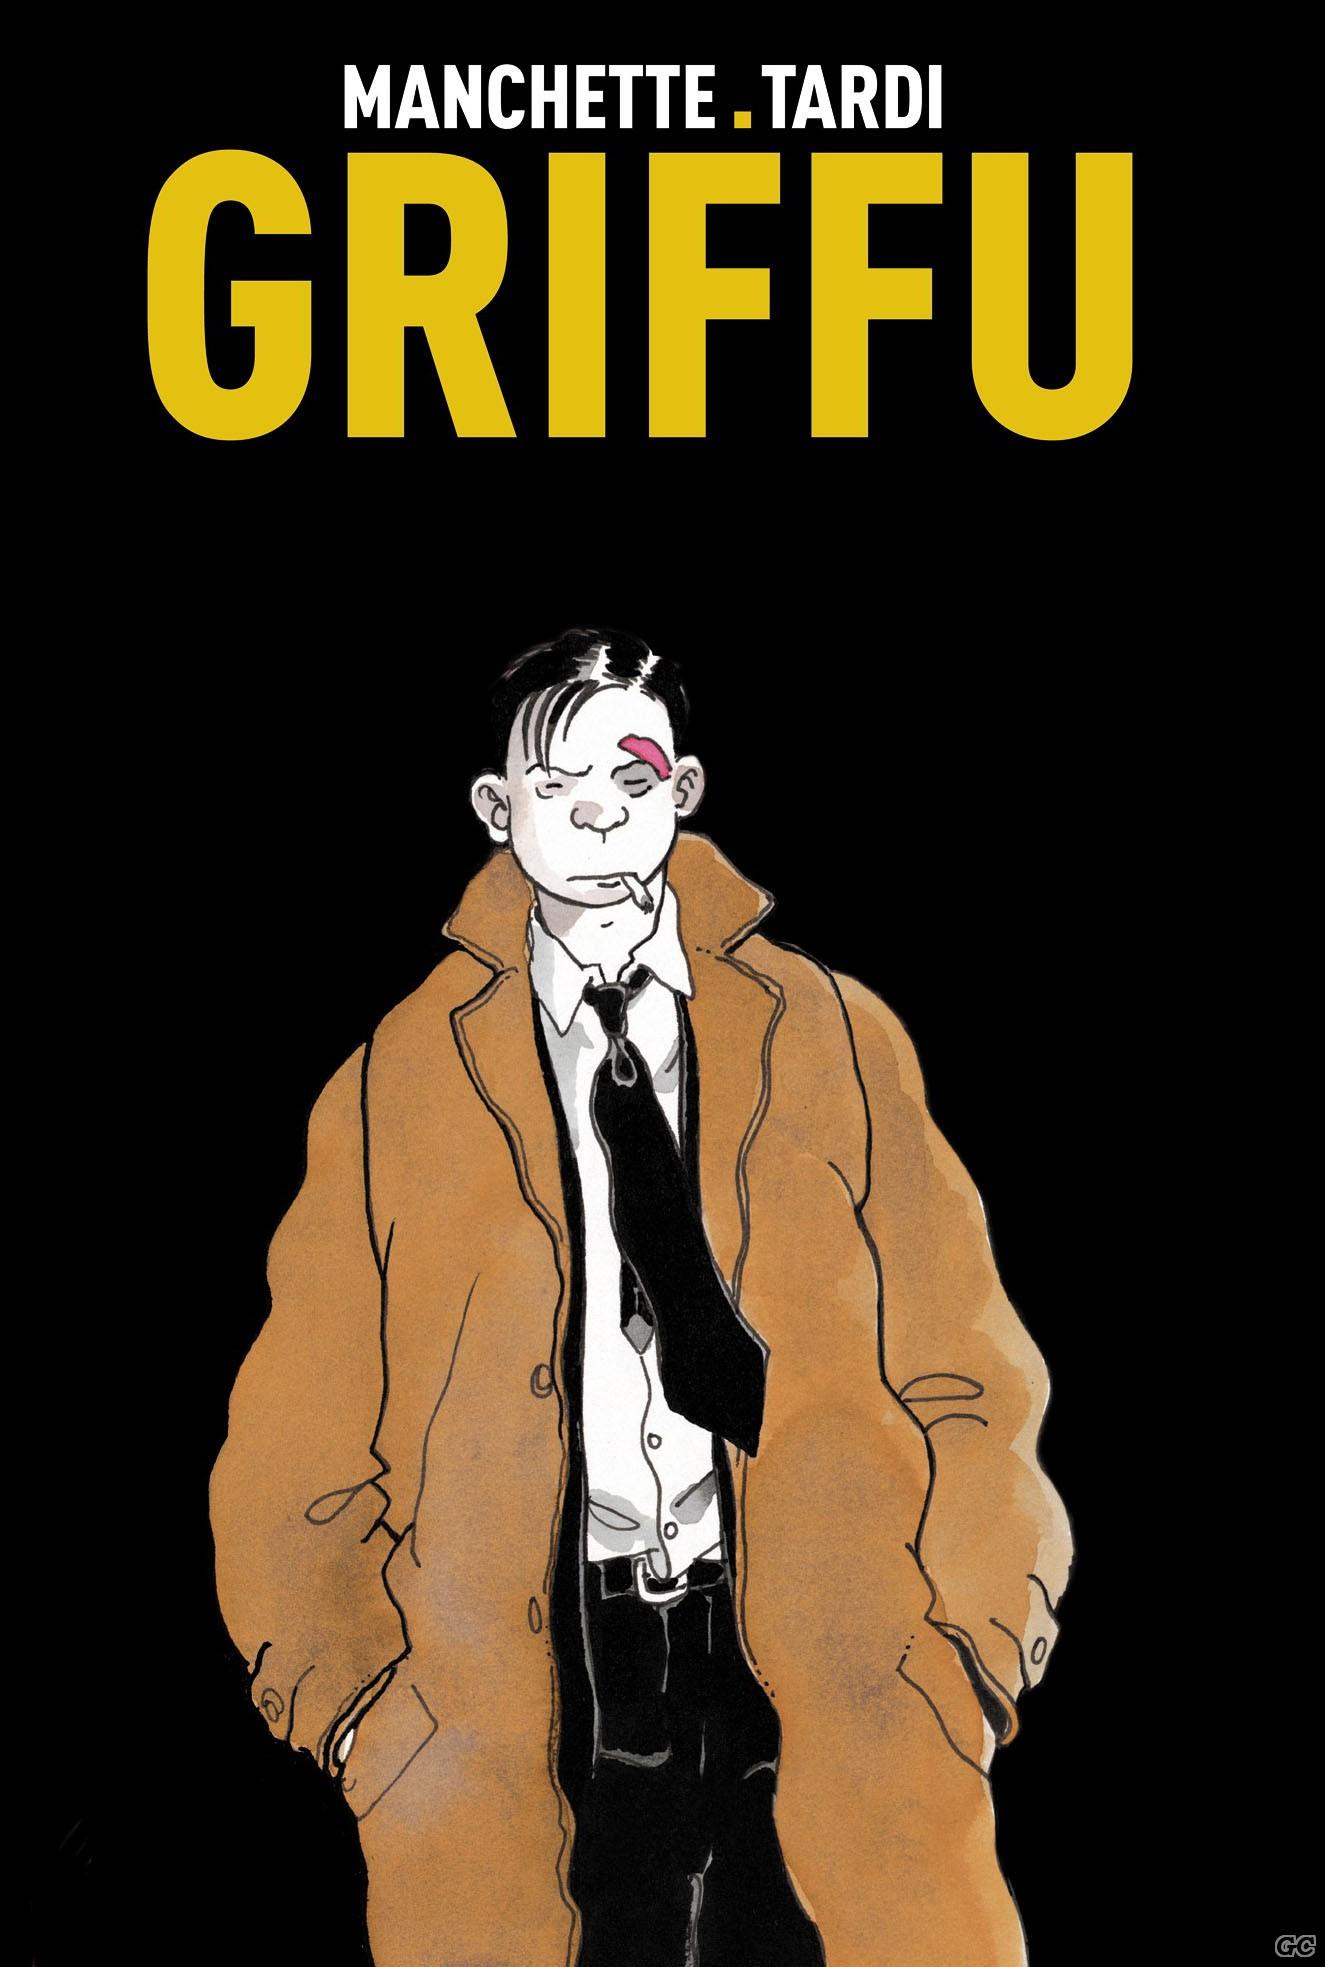 GRIFFU